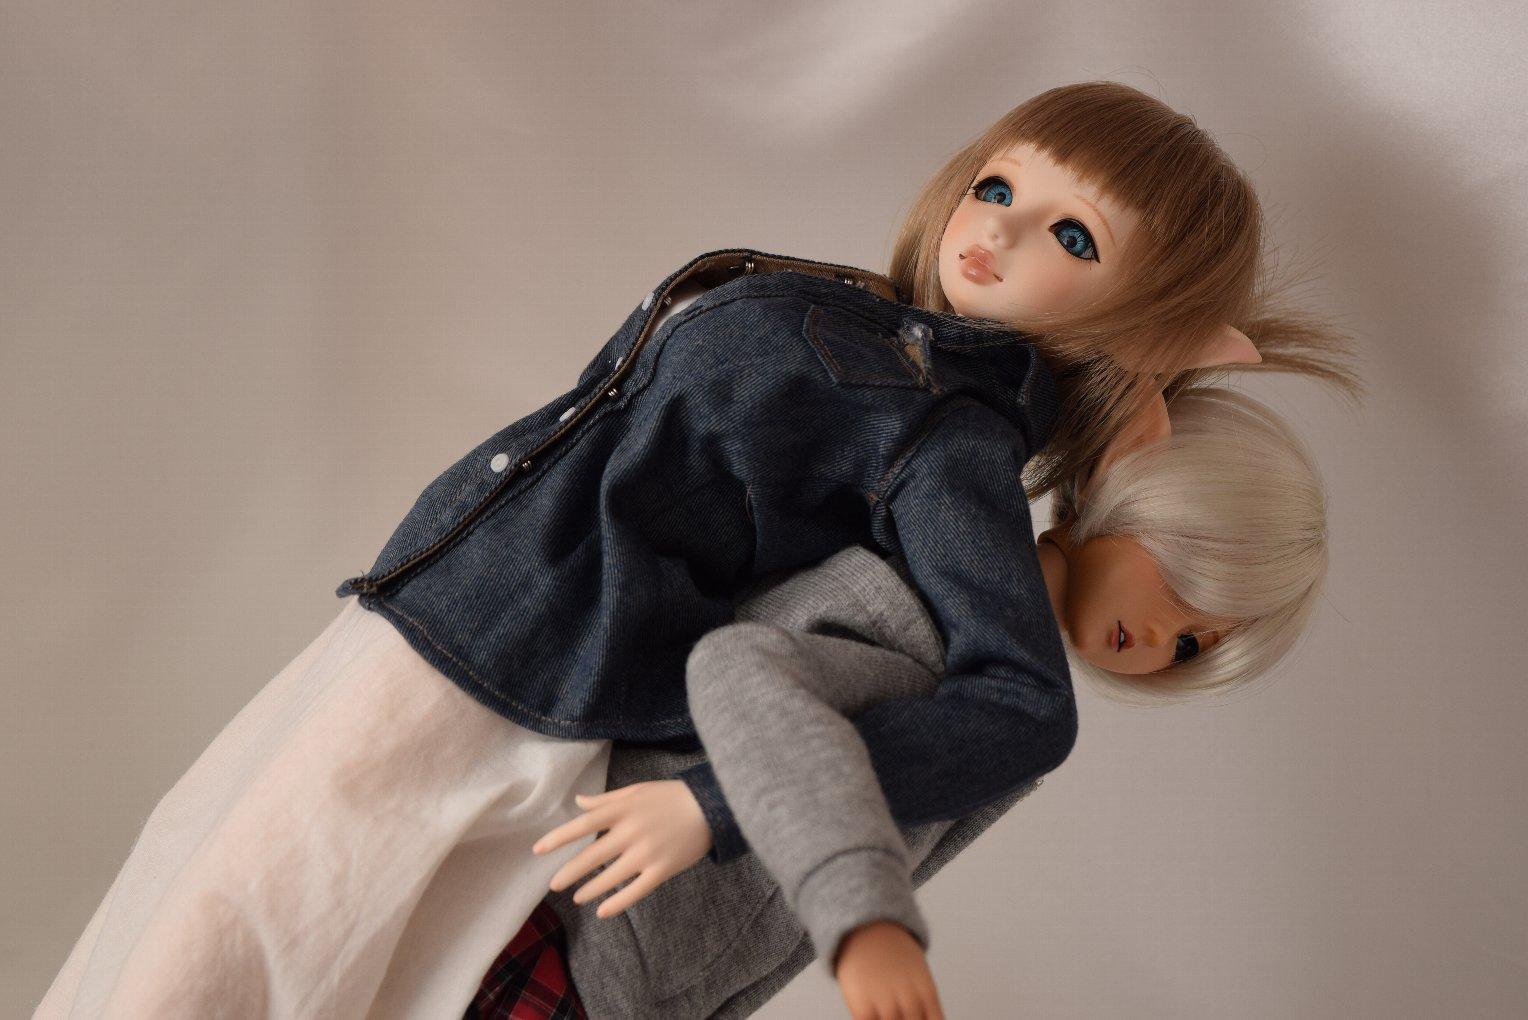 doll_3295.jpg